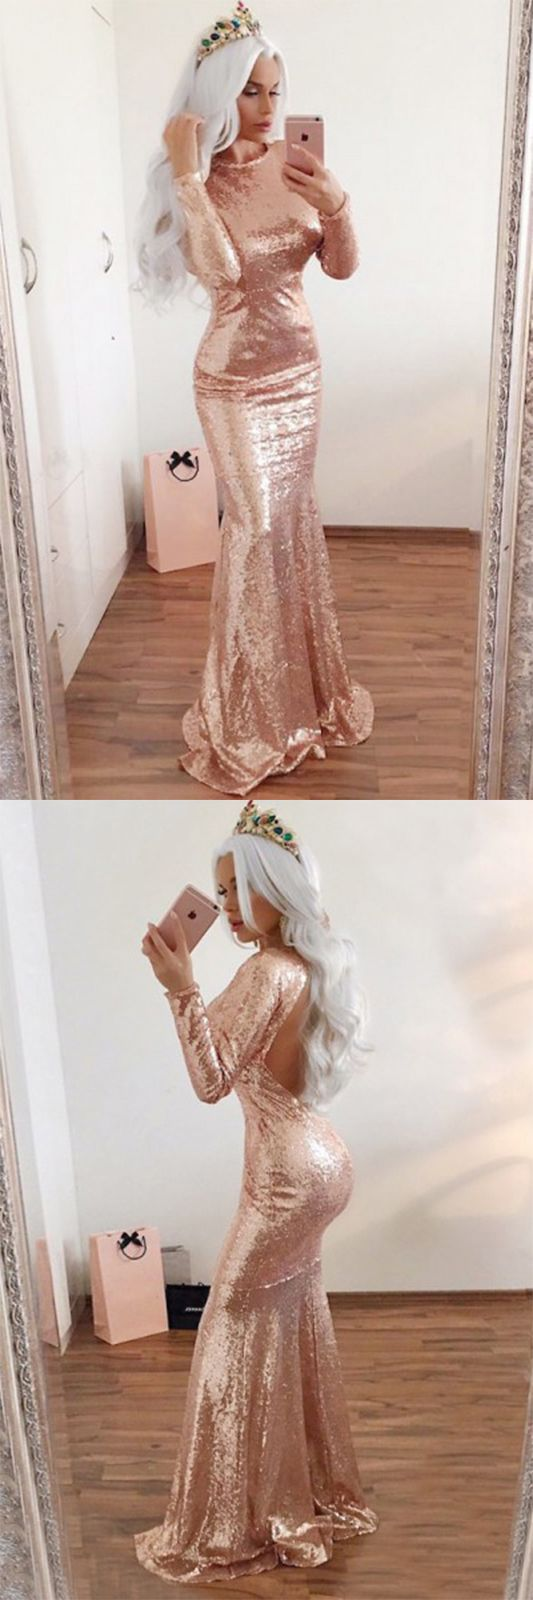 Mermaid Prom Dresses,Long Sleeve Prom Dress,Rose Gold Prom Dresses,Sequined Prom Dress,Long Prom Dresses #mermaid #sequins #longsleeve #prom #bling #long #okdresses